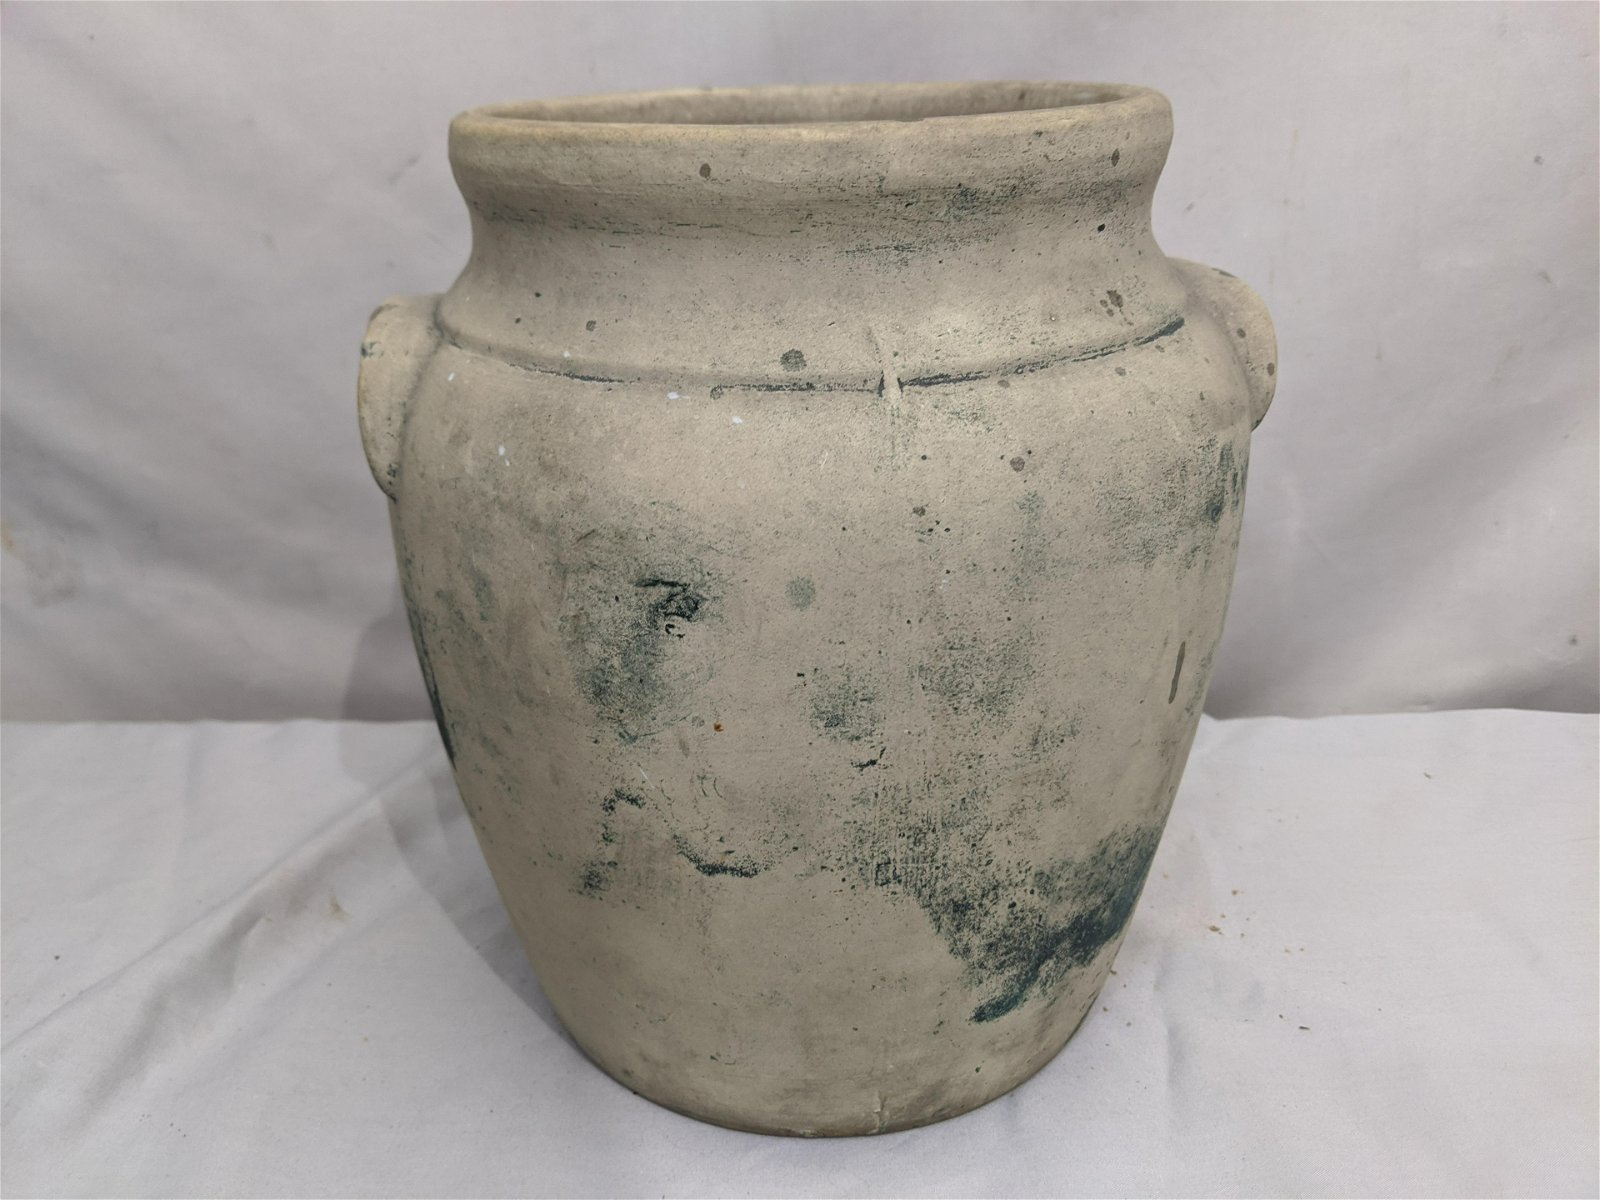 Antique Ransburg Handpainted Cookie Jar Stoneware Crock